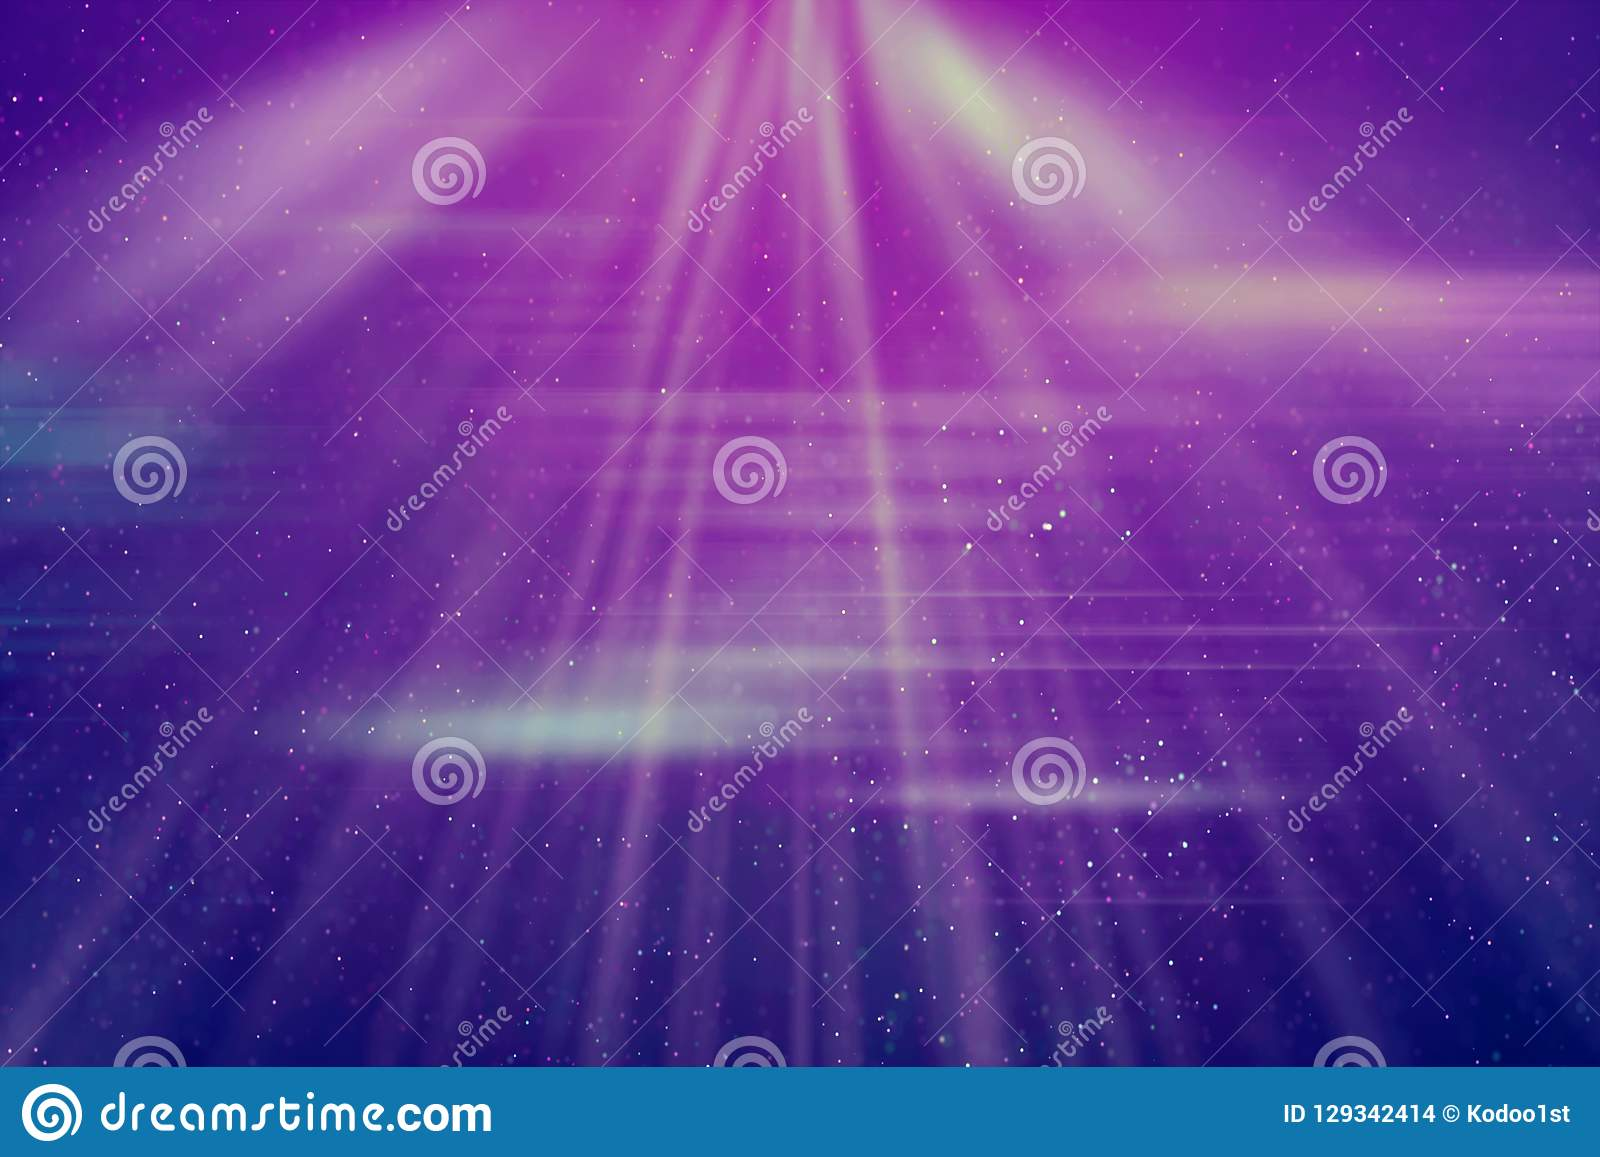 Абстрактная винтажная предпосылка световых лучей